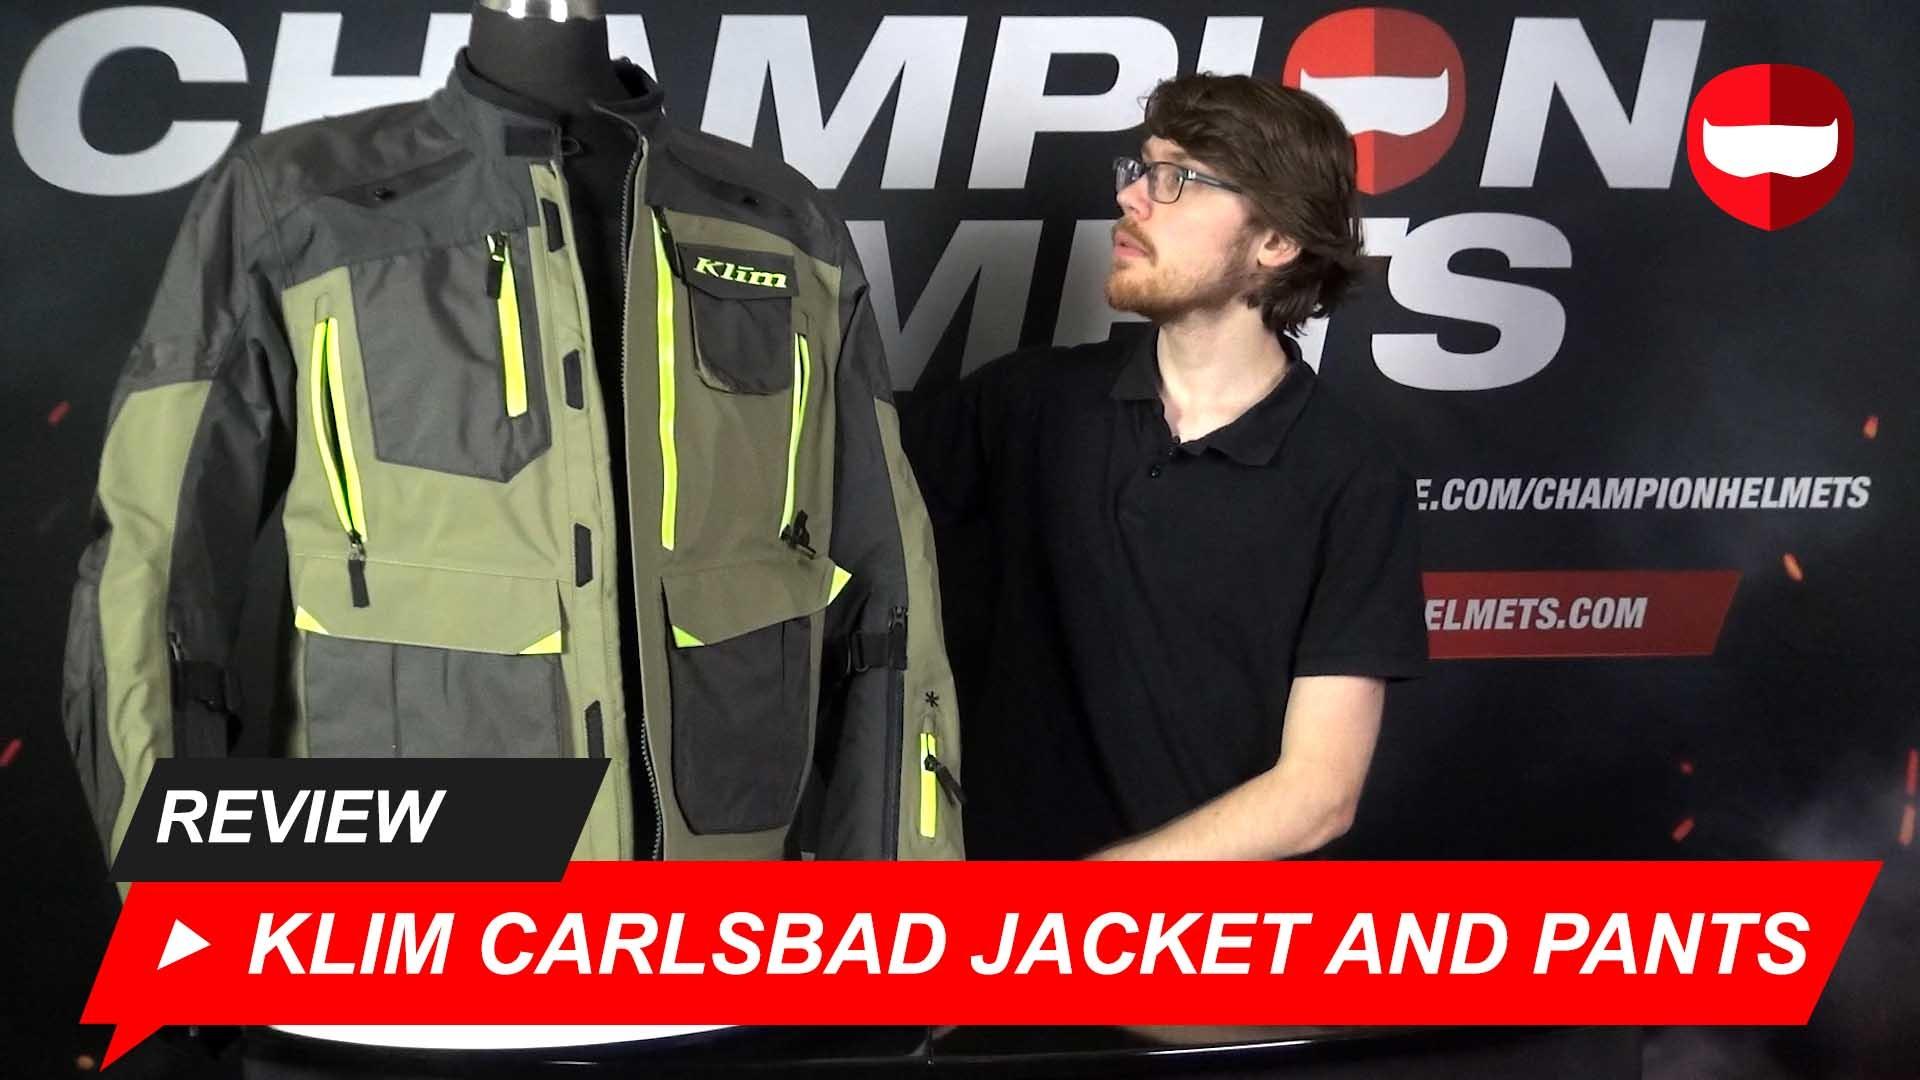 Klim Carlsbad Jacket and Pants Review + Video